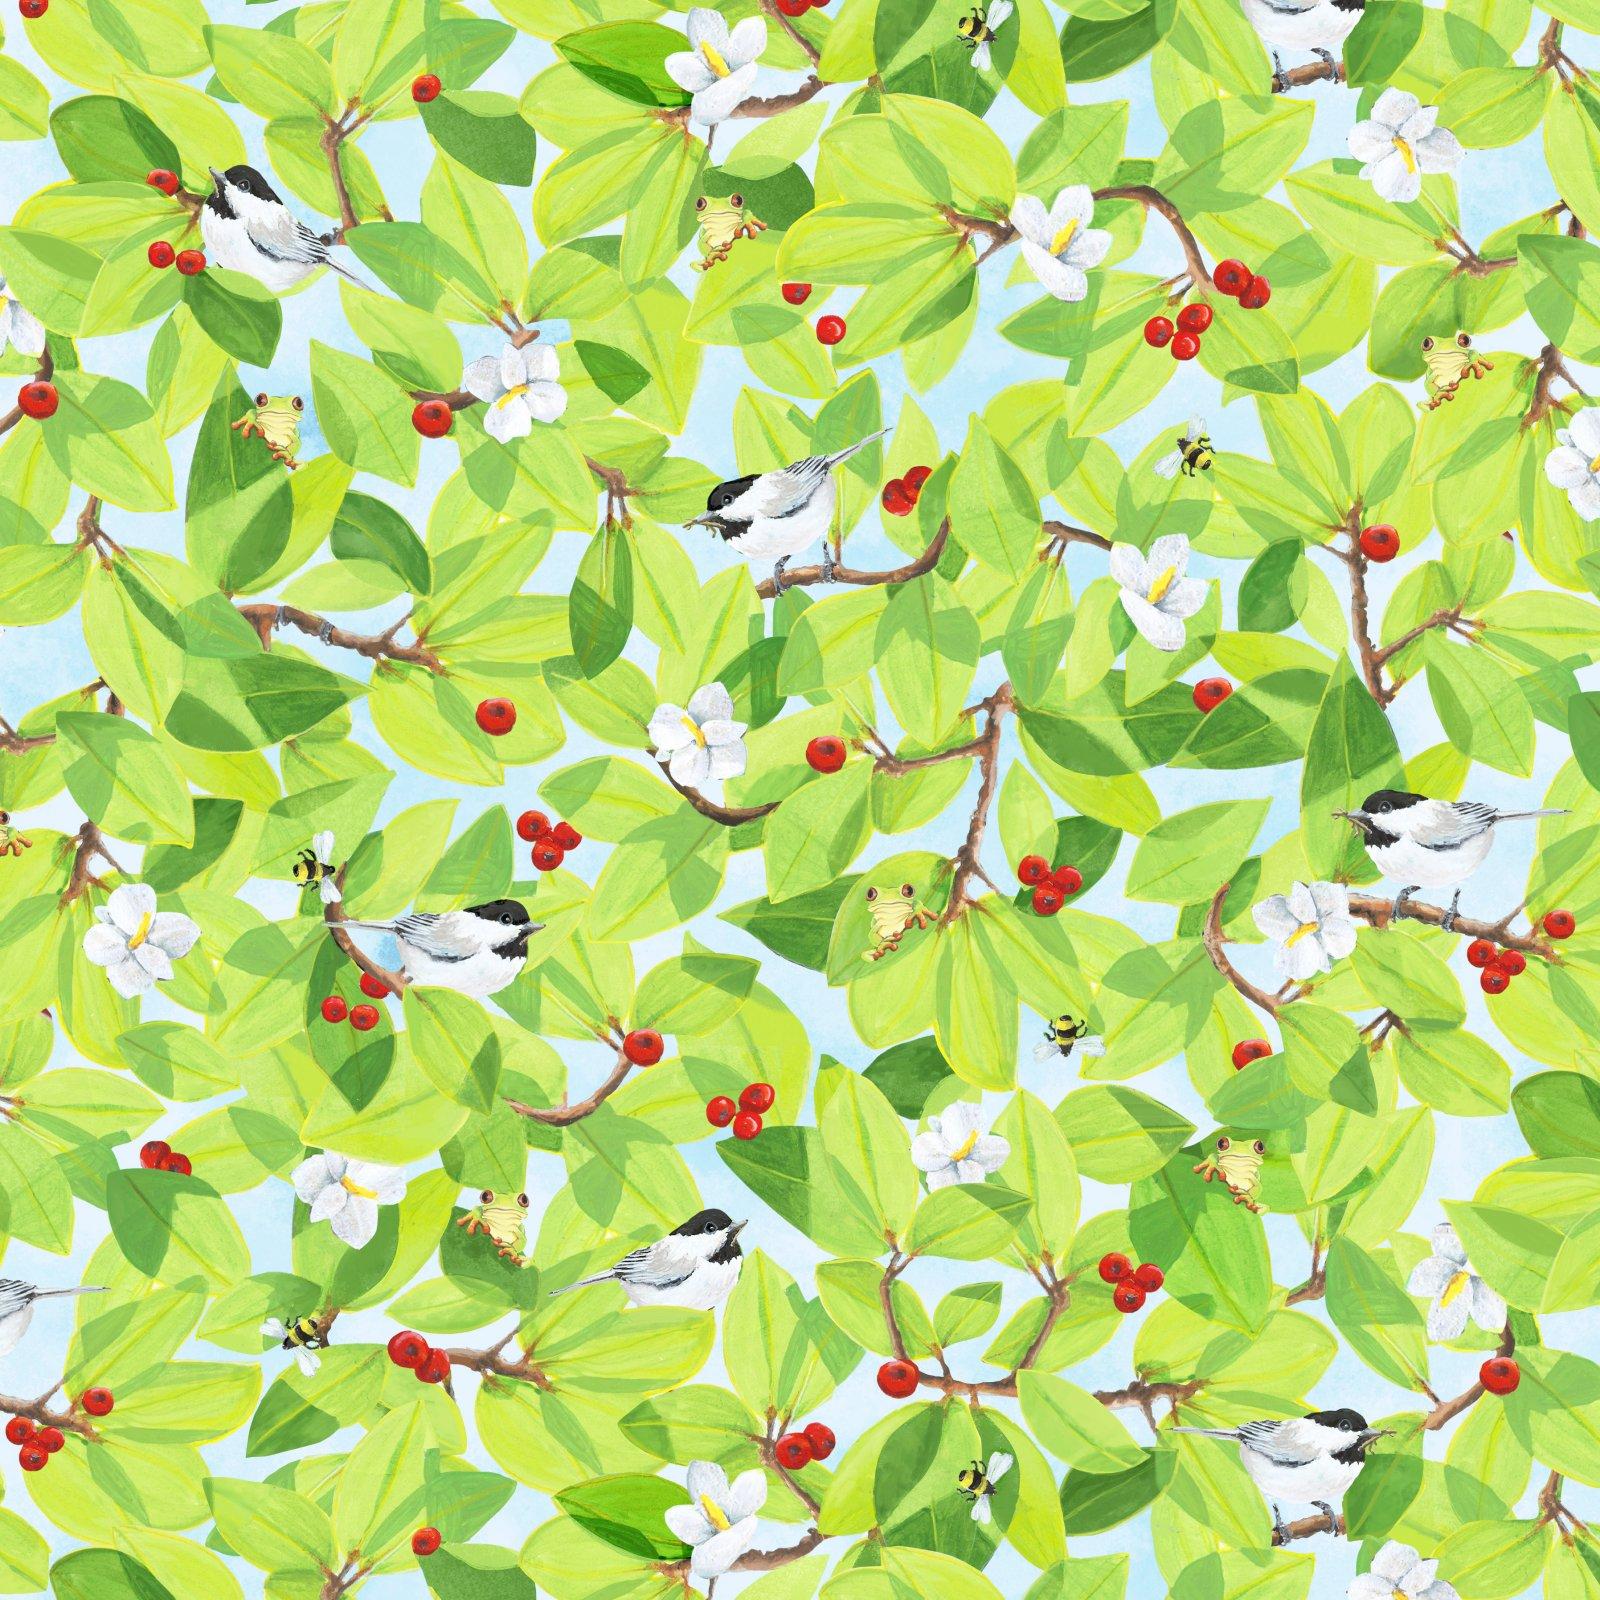 SWIN-4534 MU - SPRING WINGS BY KATHY KEHOE BAMBECK BIRD & LEAVES MULTI - ARRIVING IN JANUARY 2022